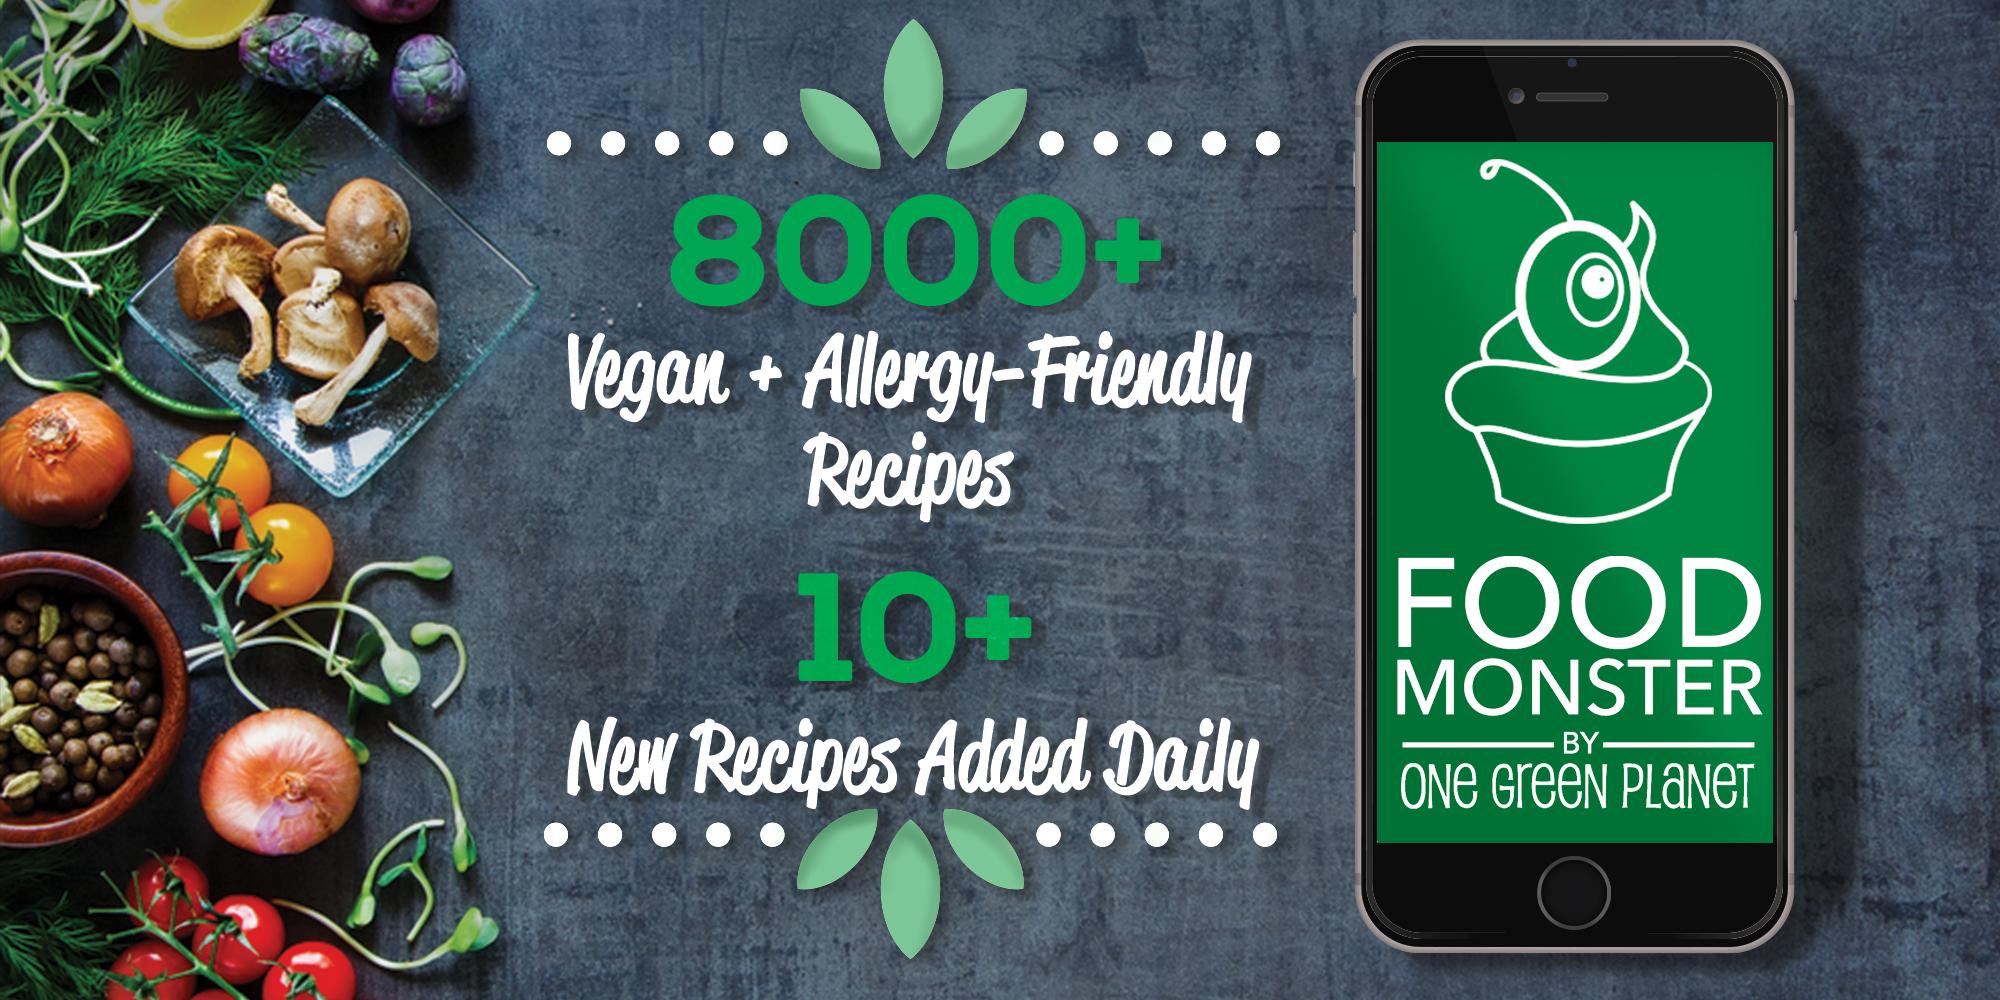 Food monster download the largest vegan food app one green planet forumfinder Gallery